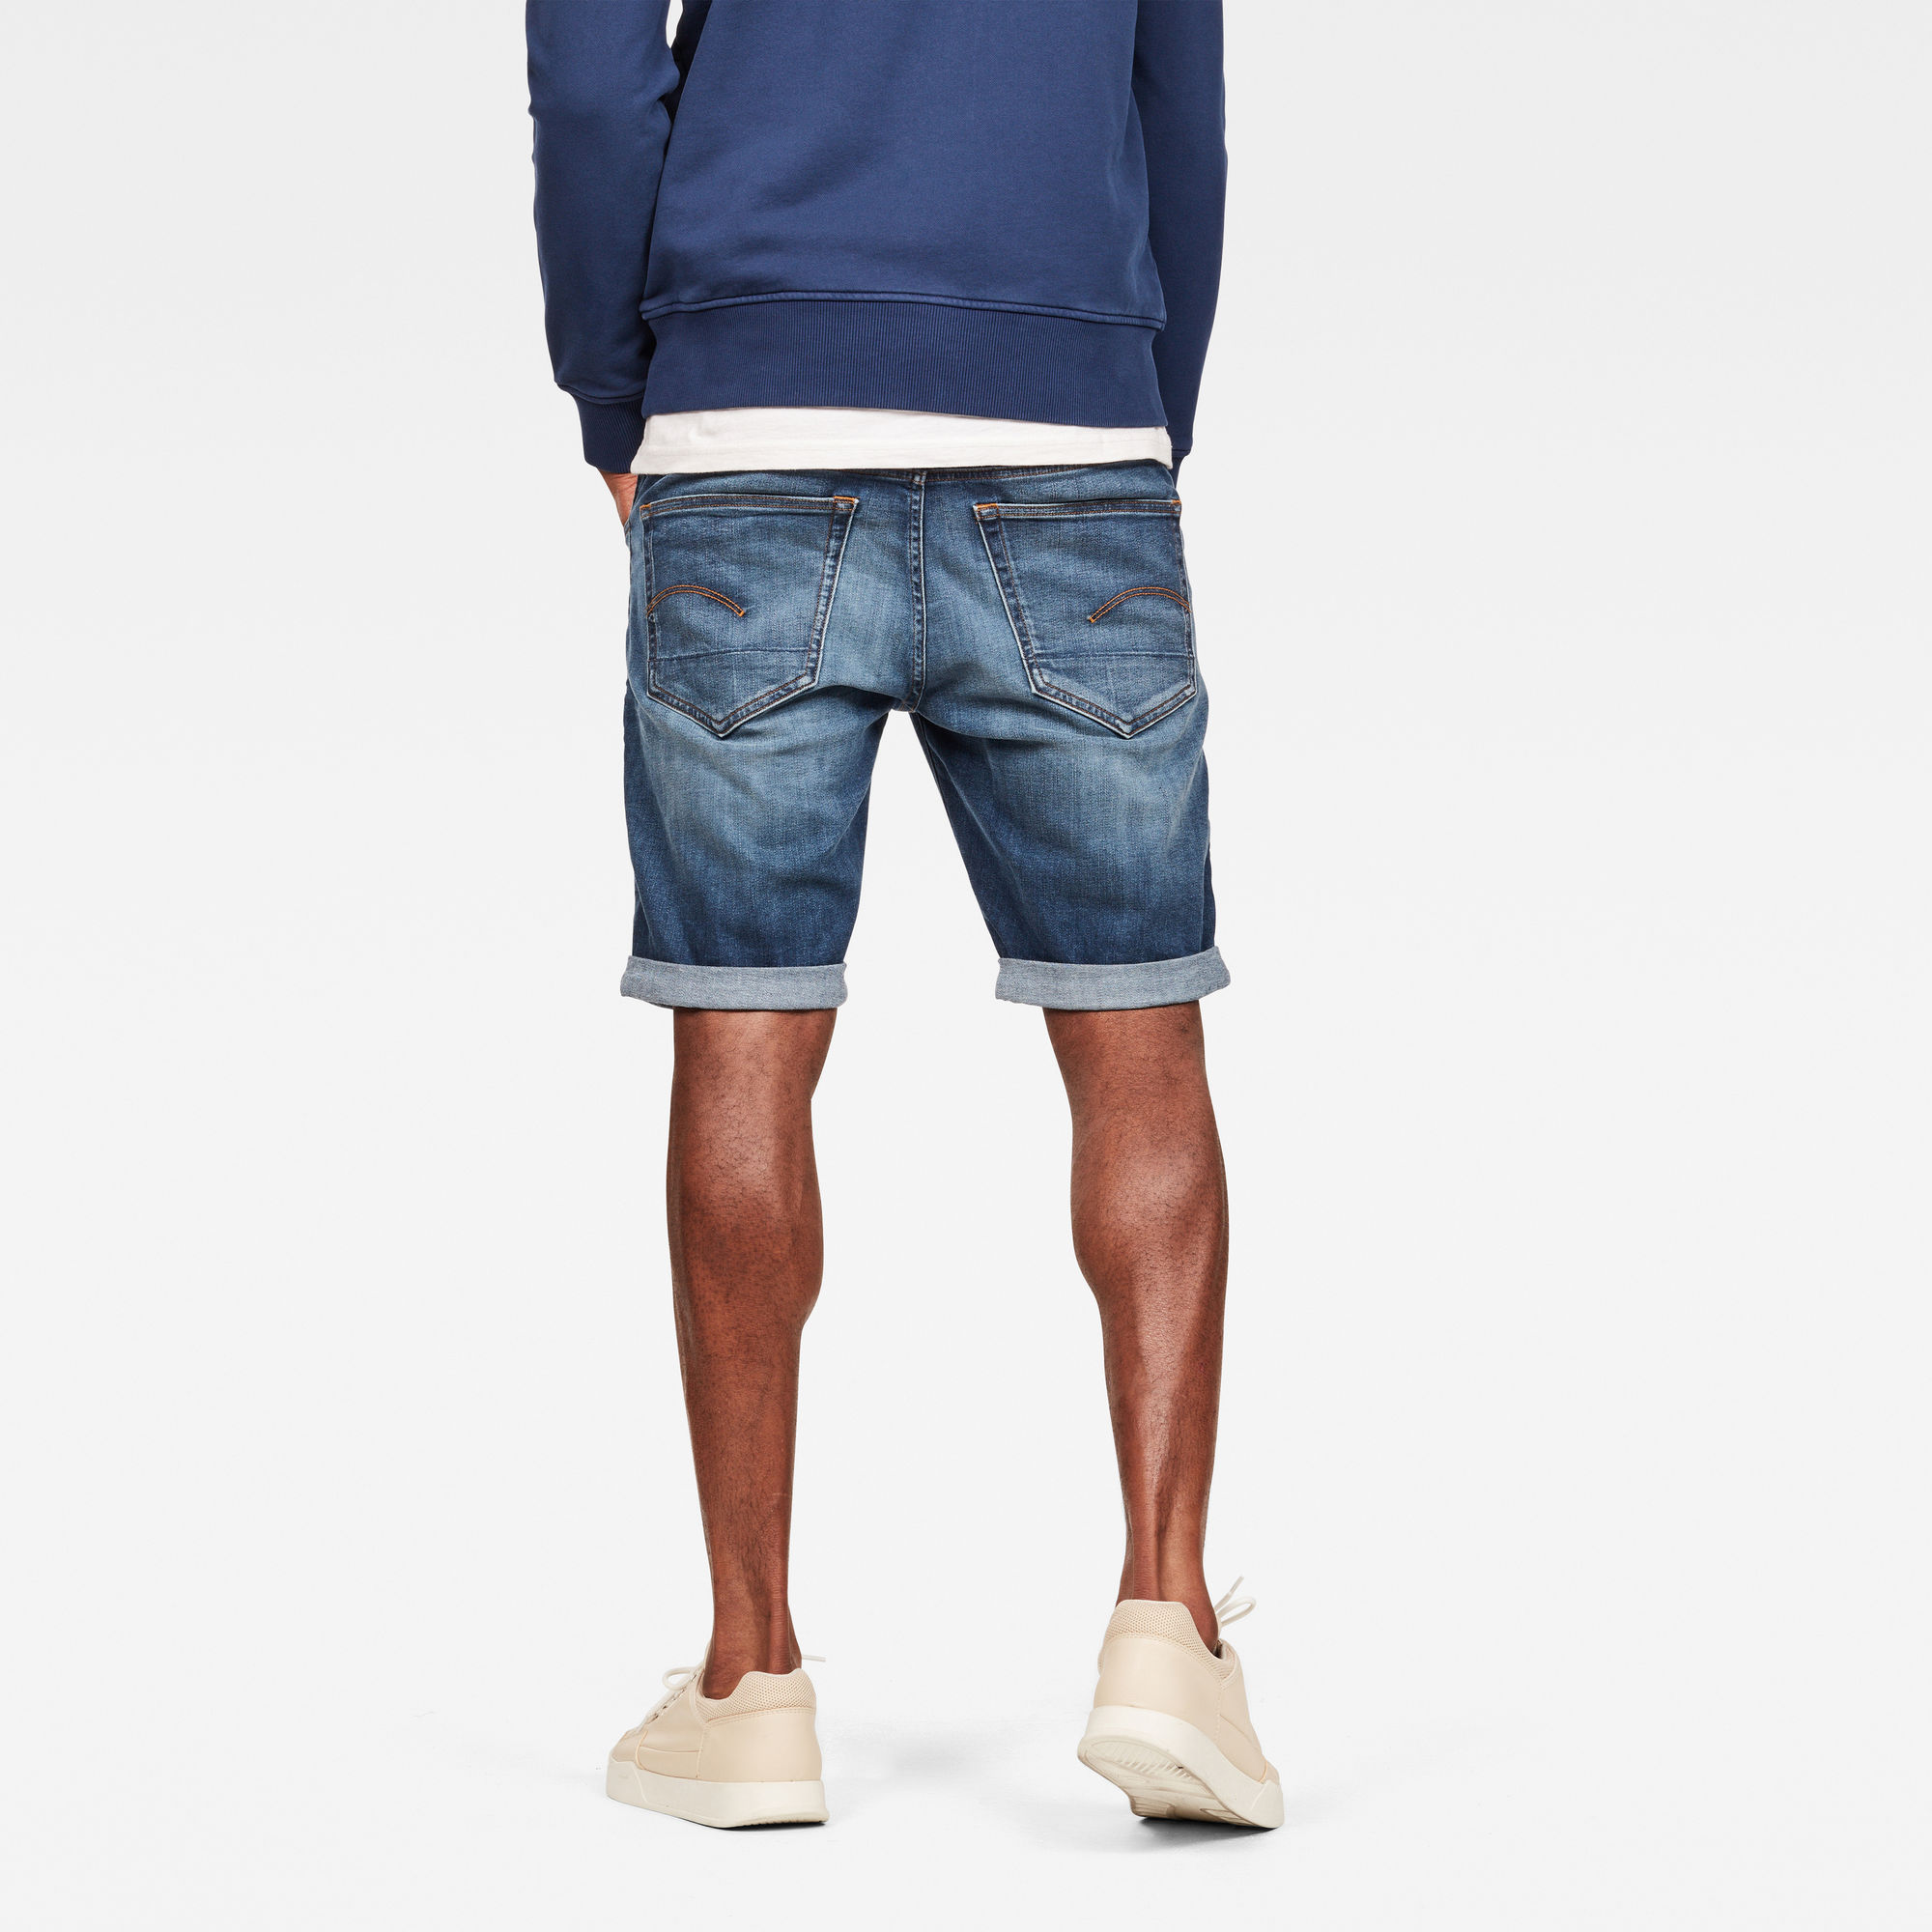 G-Star RAW 3301 Slim Short